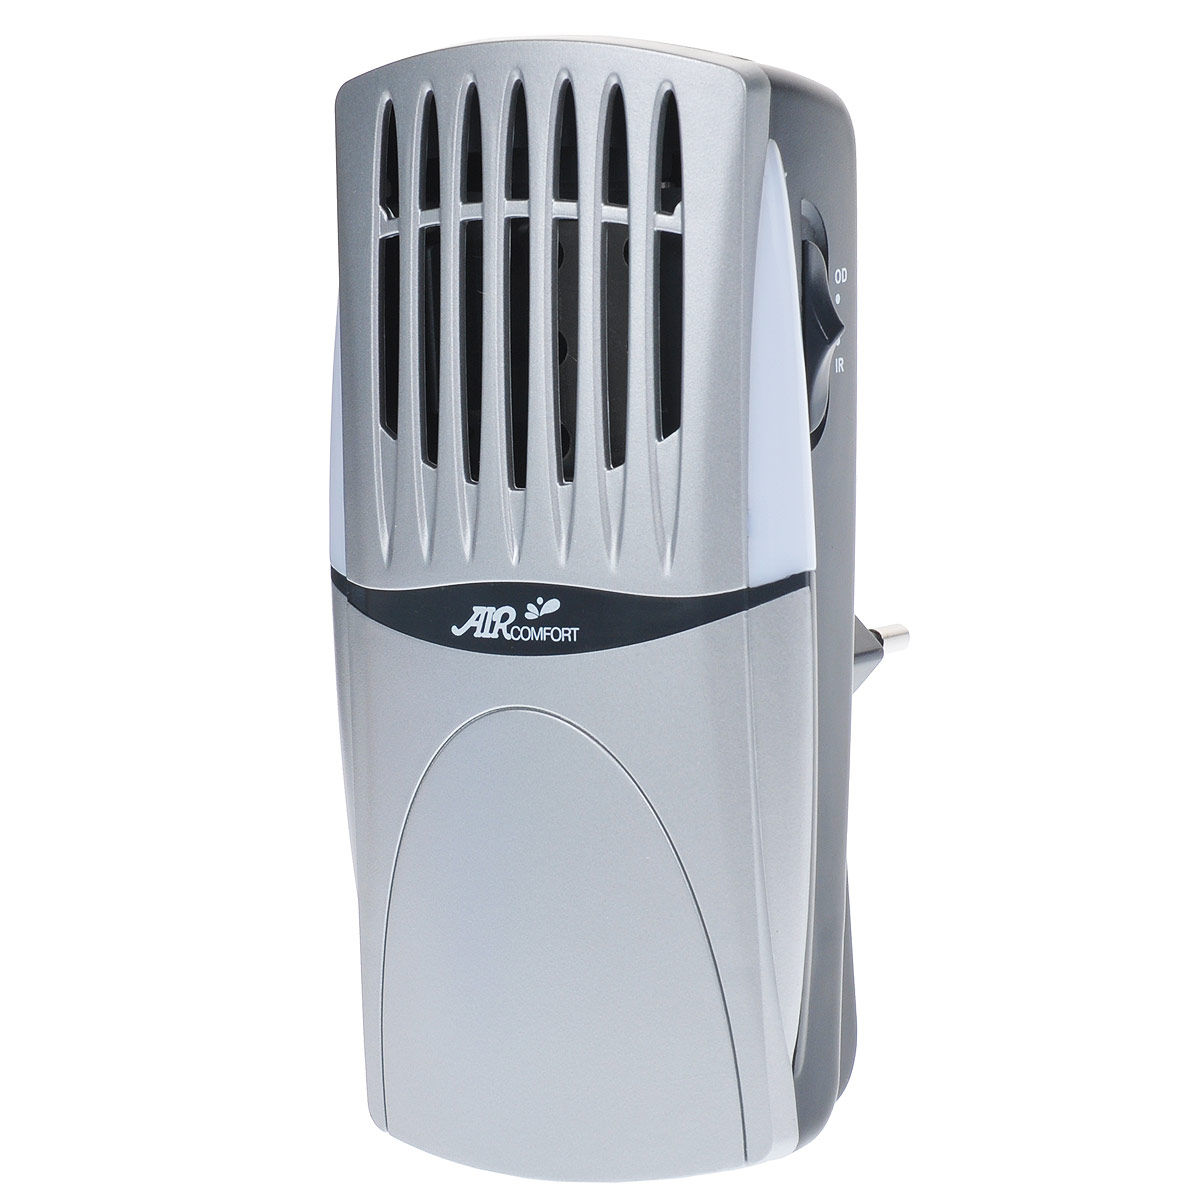 AirComfort GH-2160S воздухоочиститель